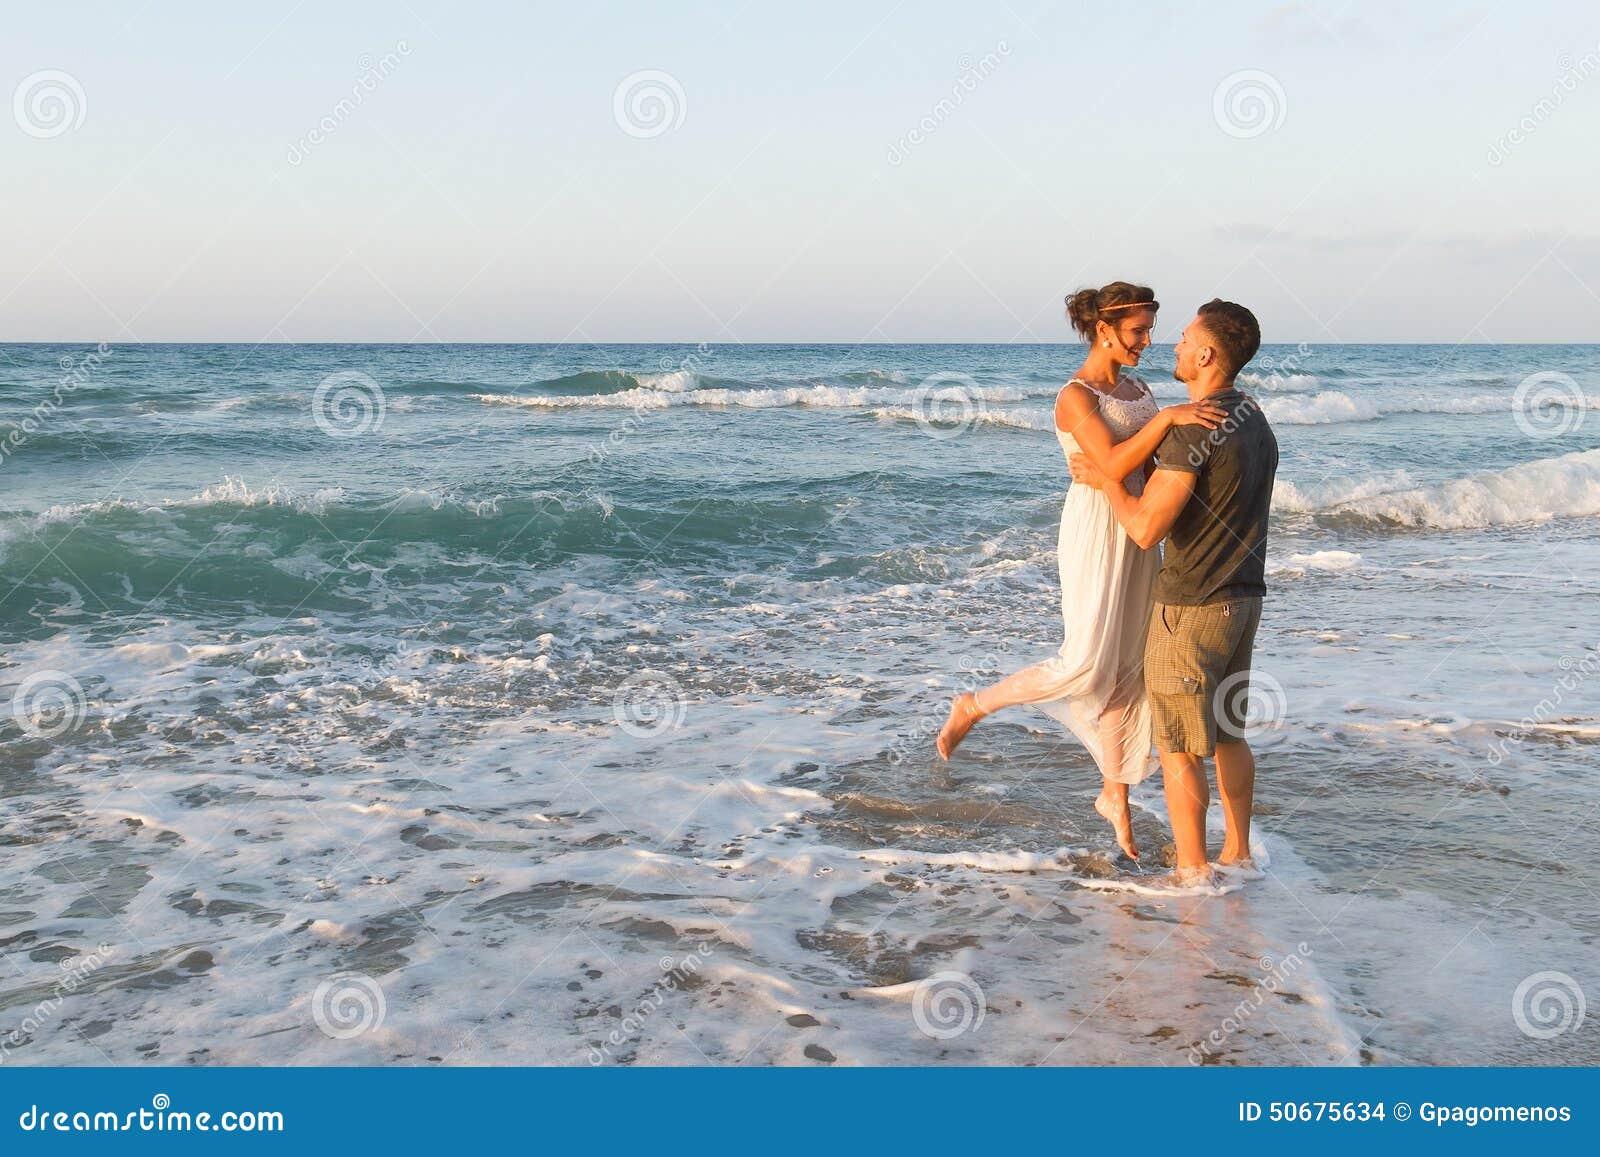 Download 年轻夫妇喜欢走在一个朦胧的海滩在 库存照片. 图片 包括有 关系, 戏弄, 幸福, 亲吻, 火箭筒, 热情地 - 50675634